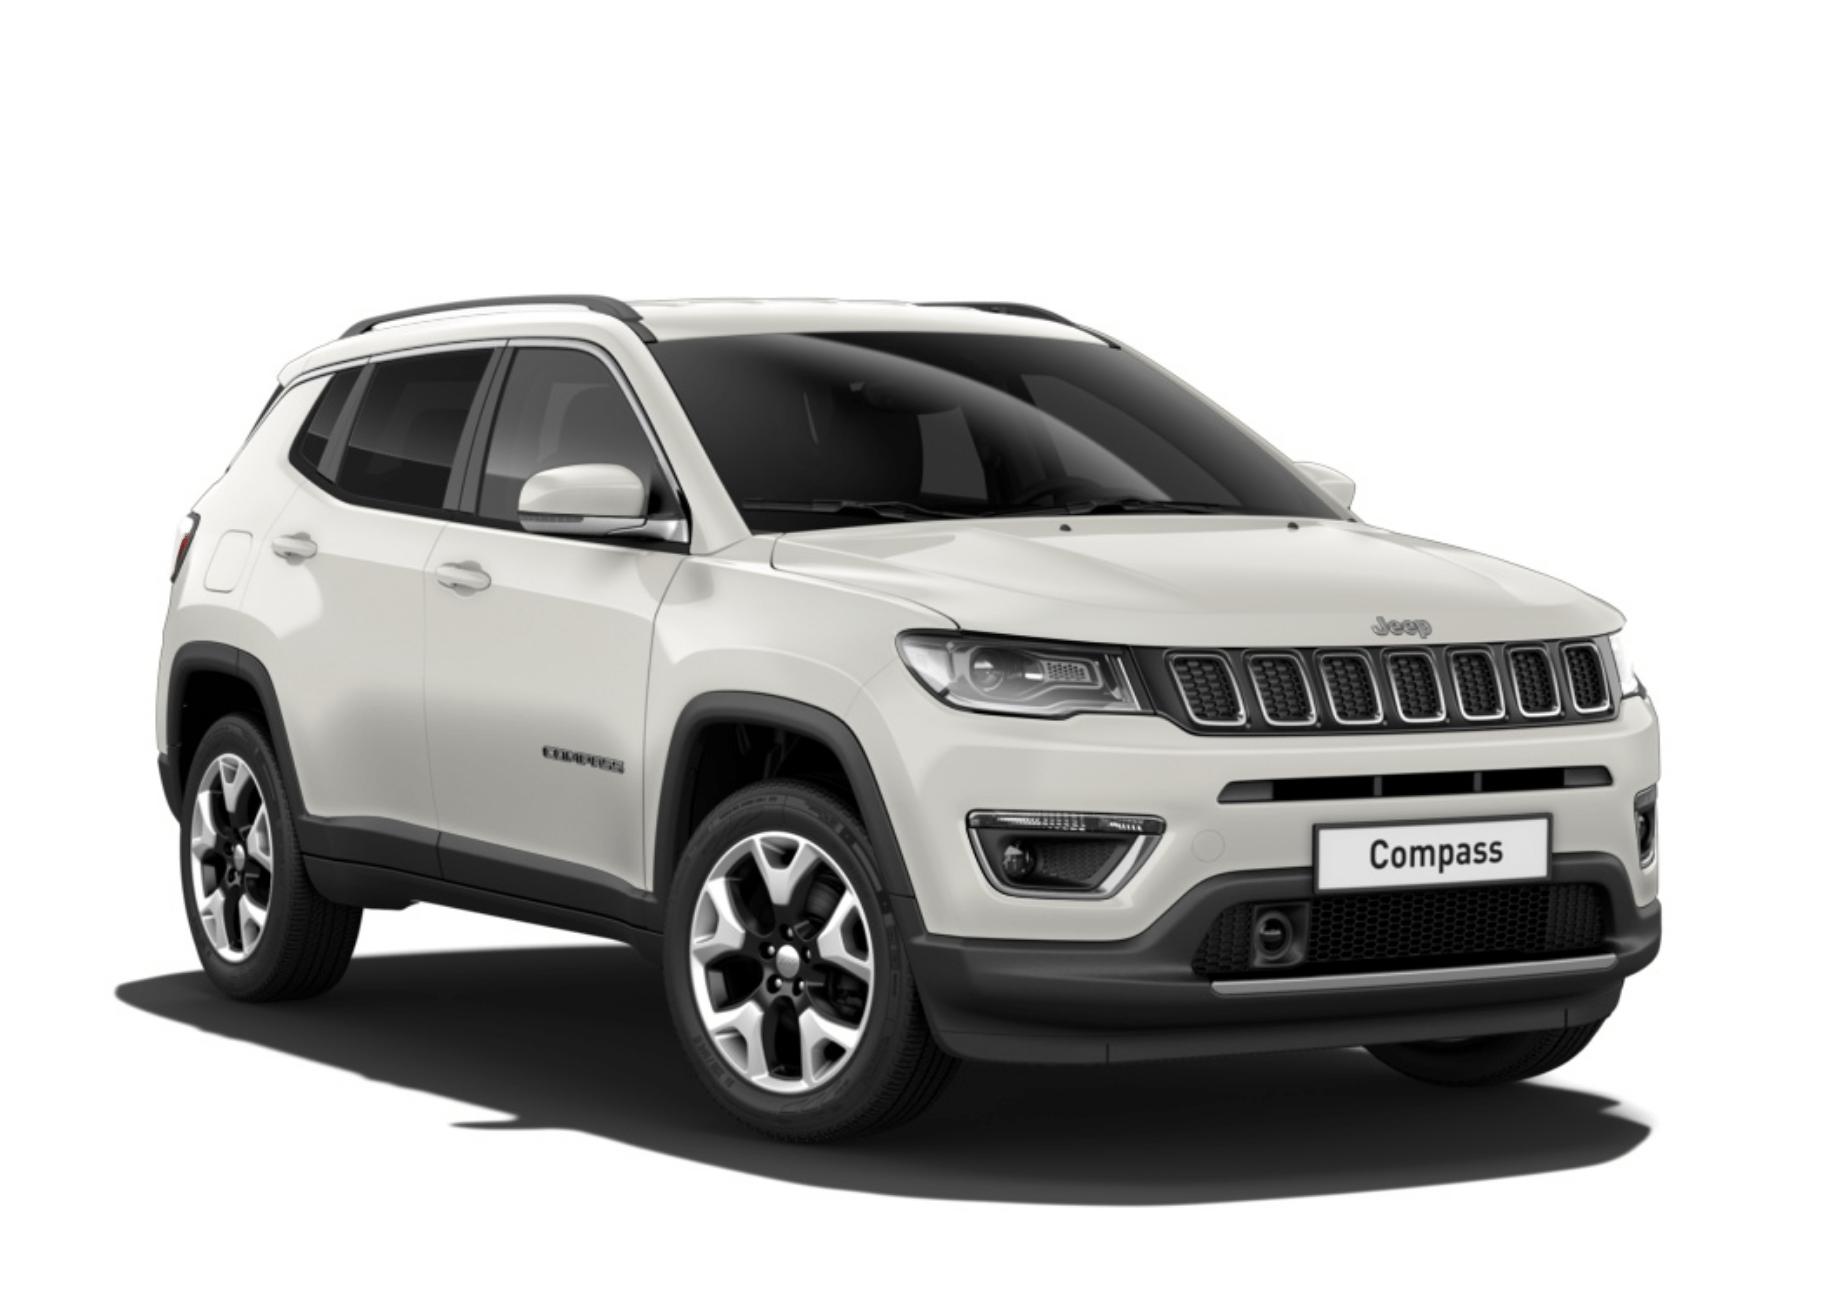 jeep nuova compass km 0 torino beinasco a partire da 21.500 euro